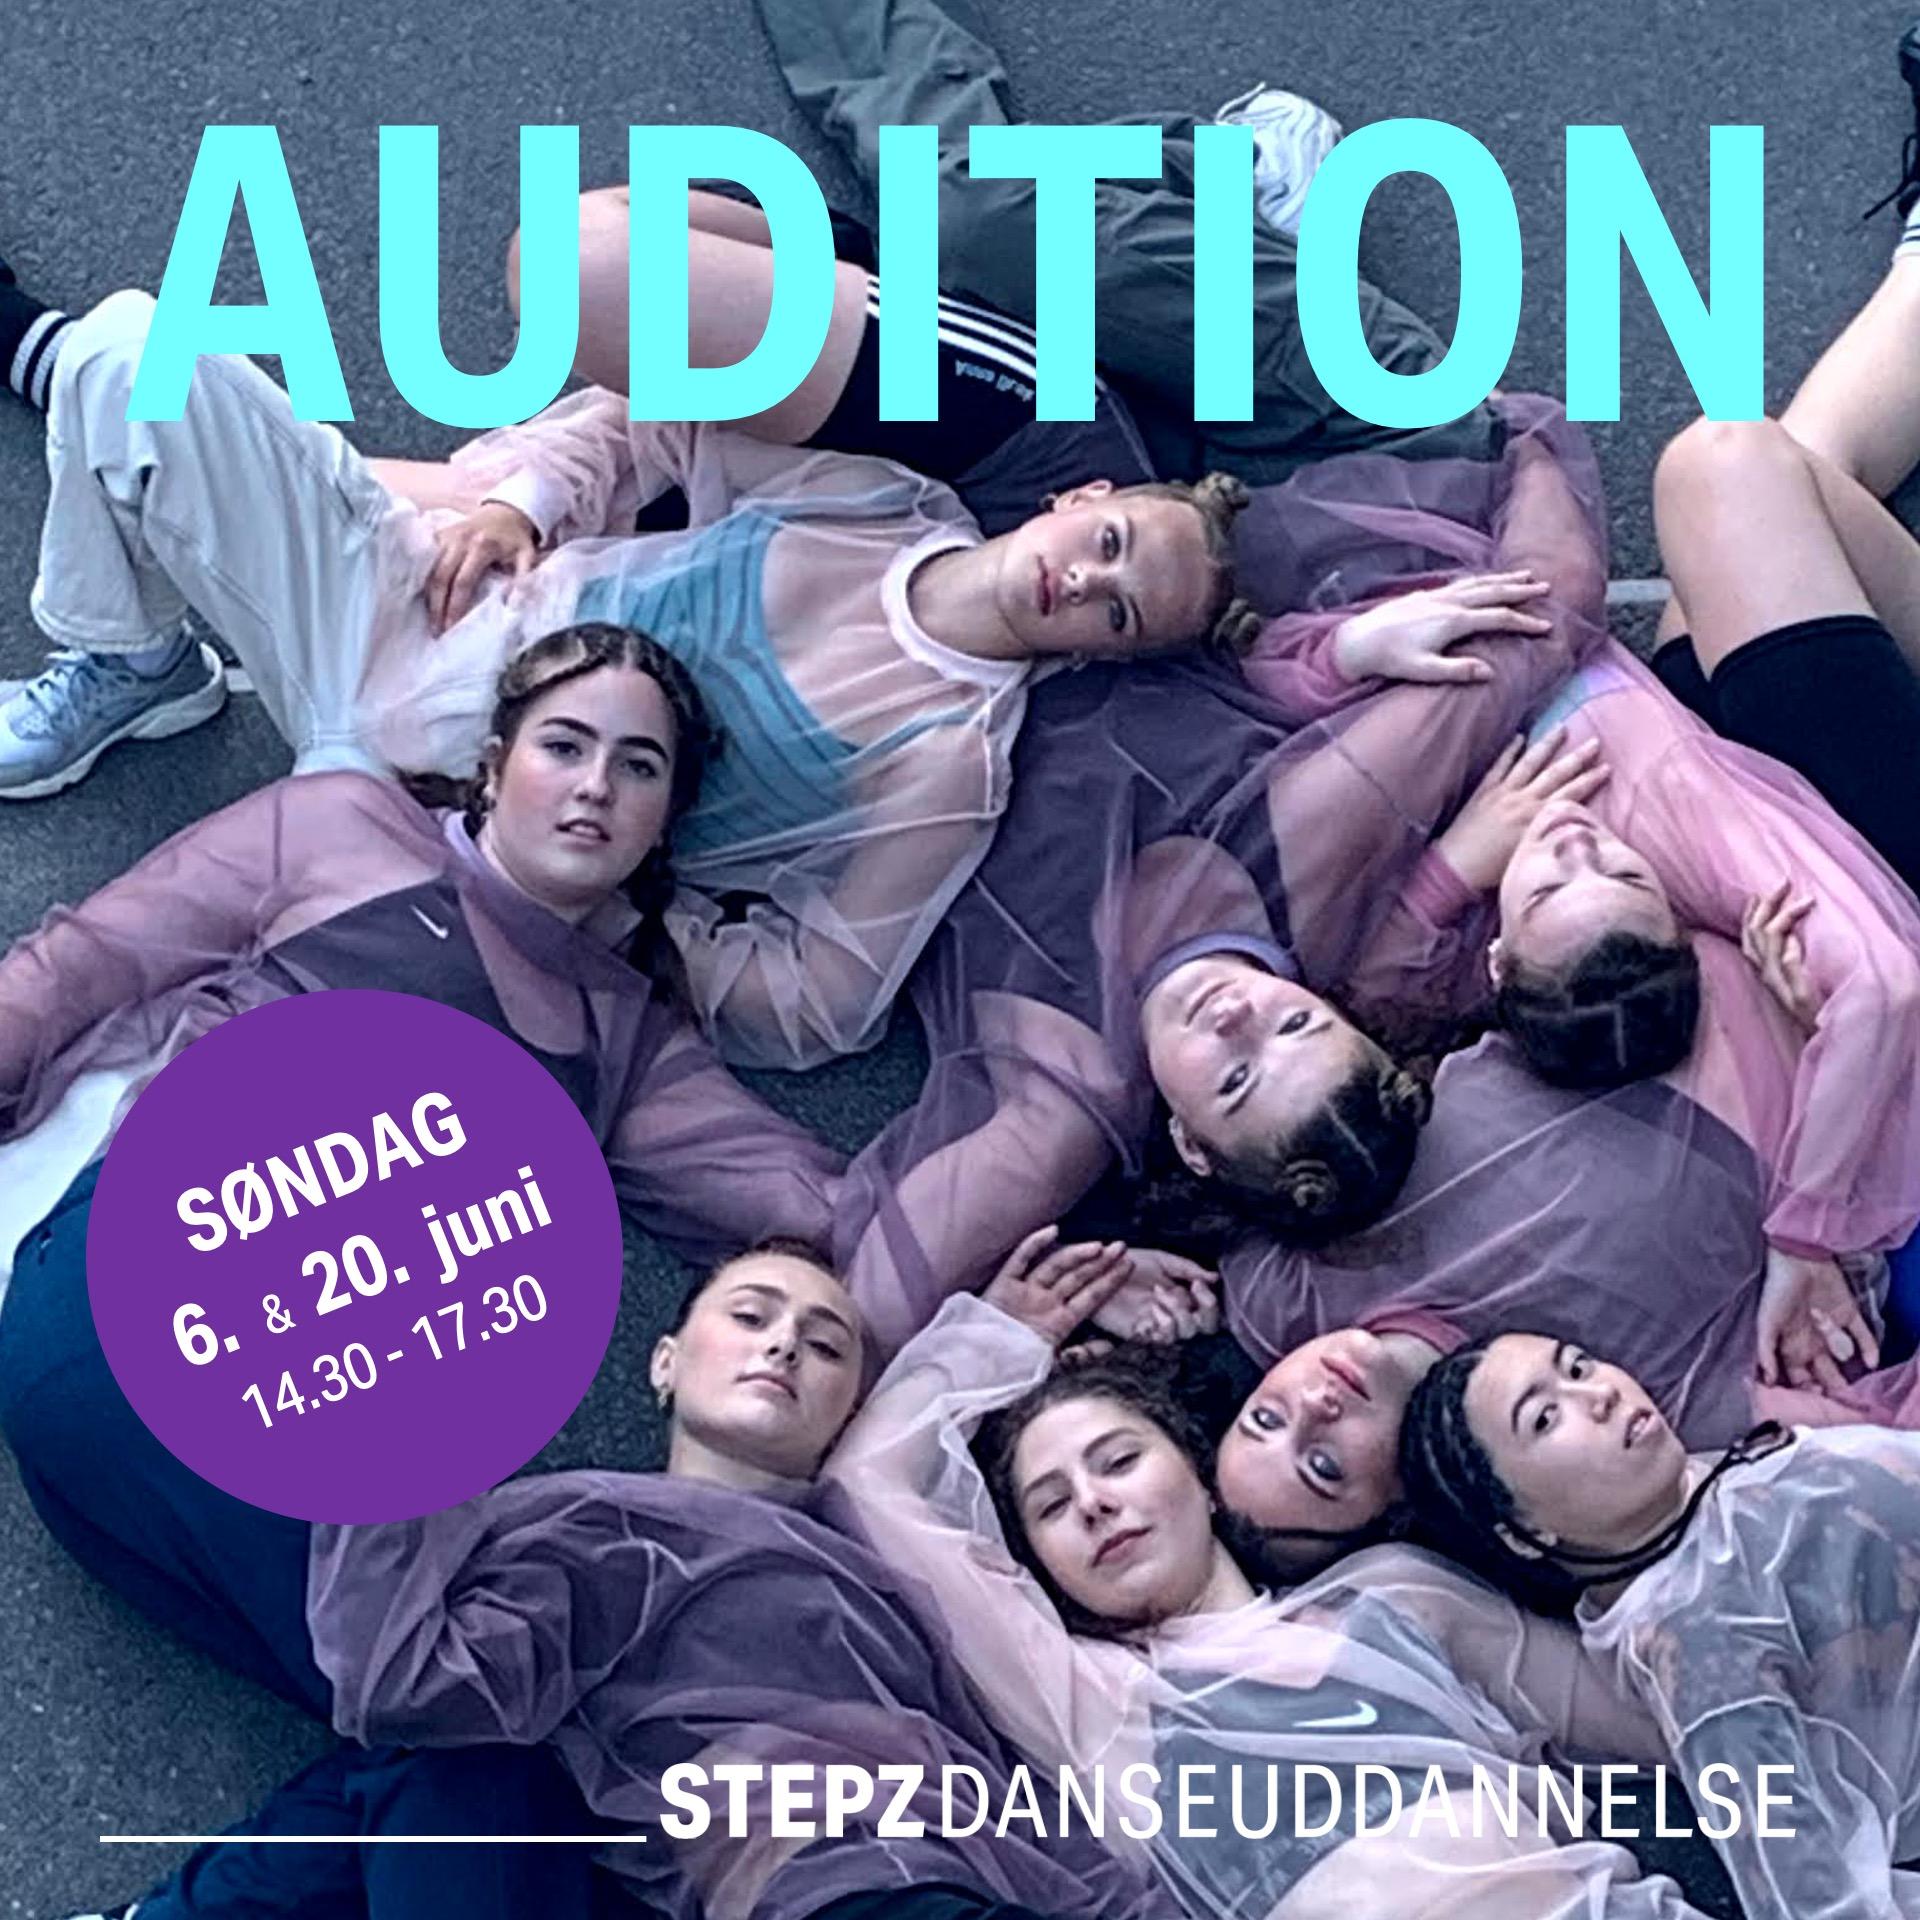 Danseuddannelsen Audition